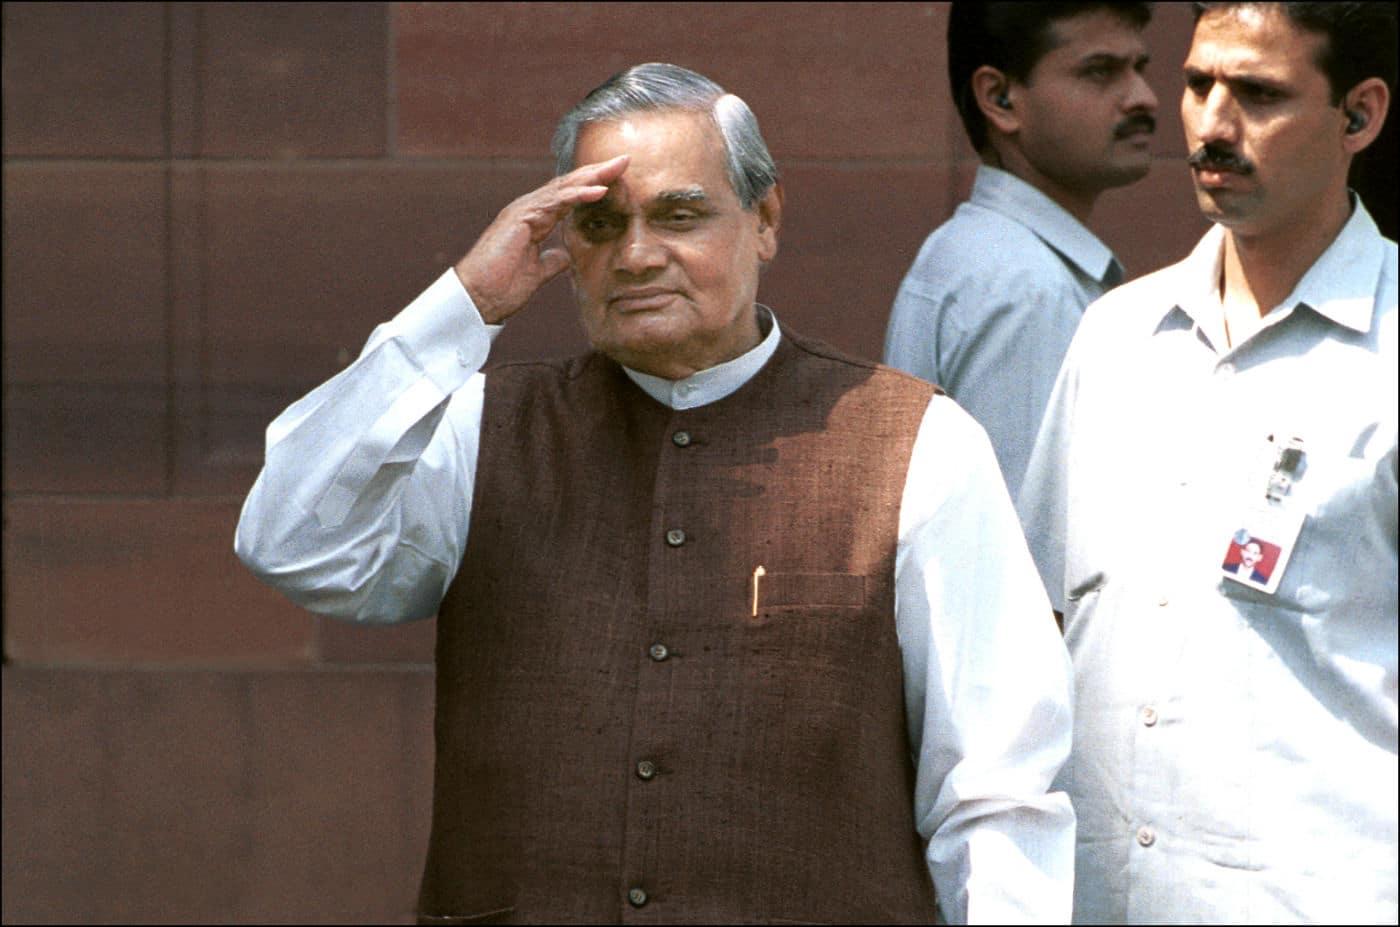 Nation mourns for Former Prime Minister Vajpayee demise